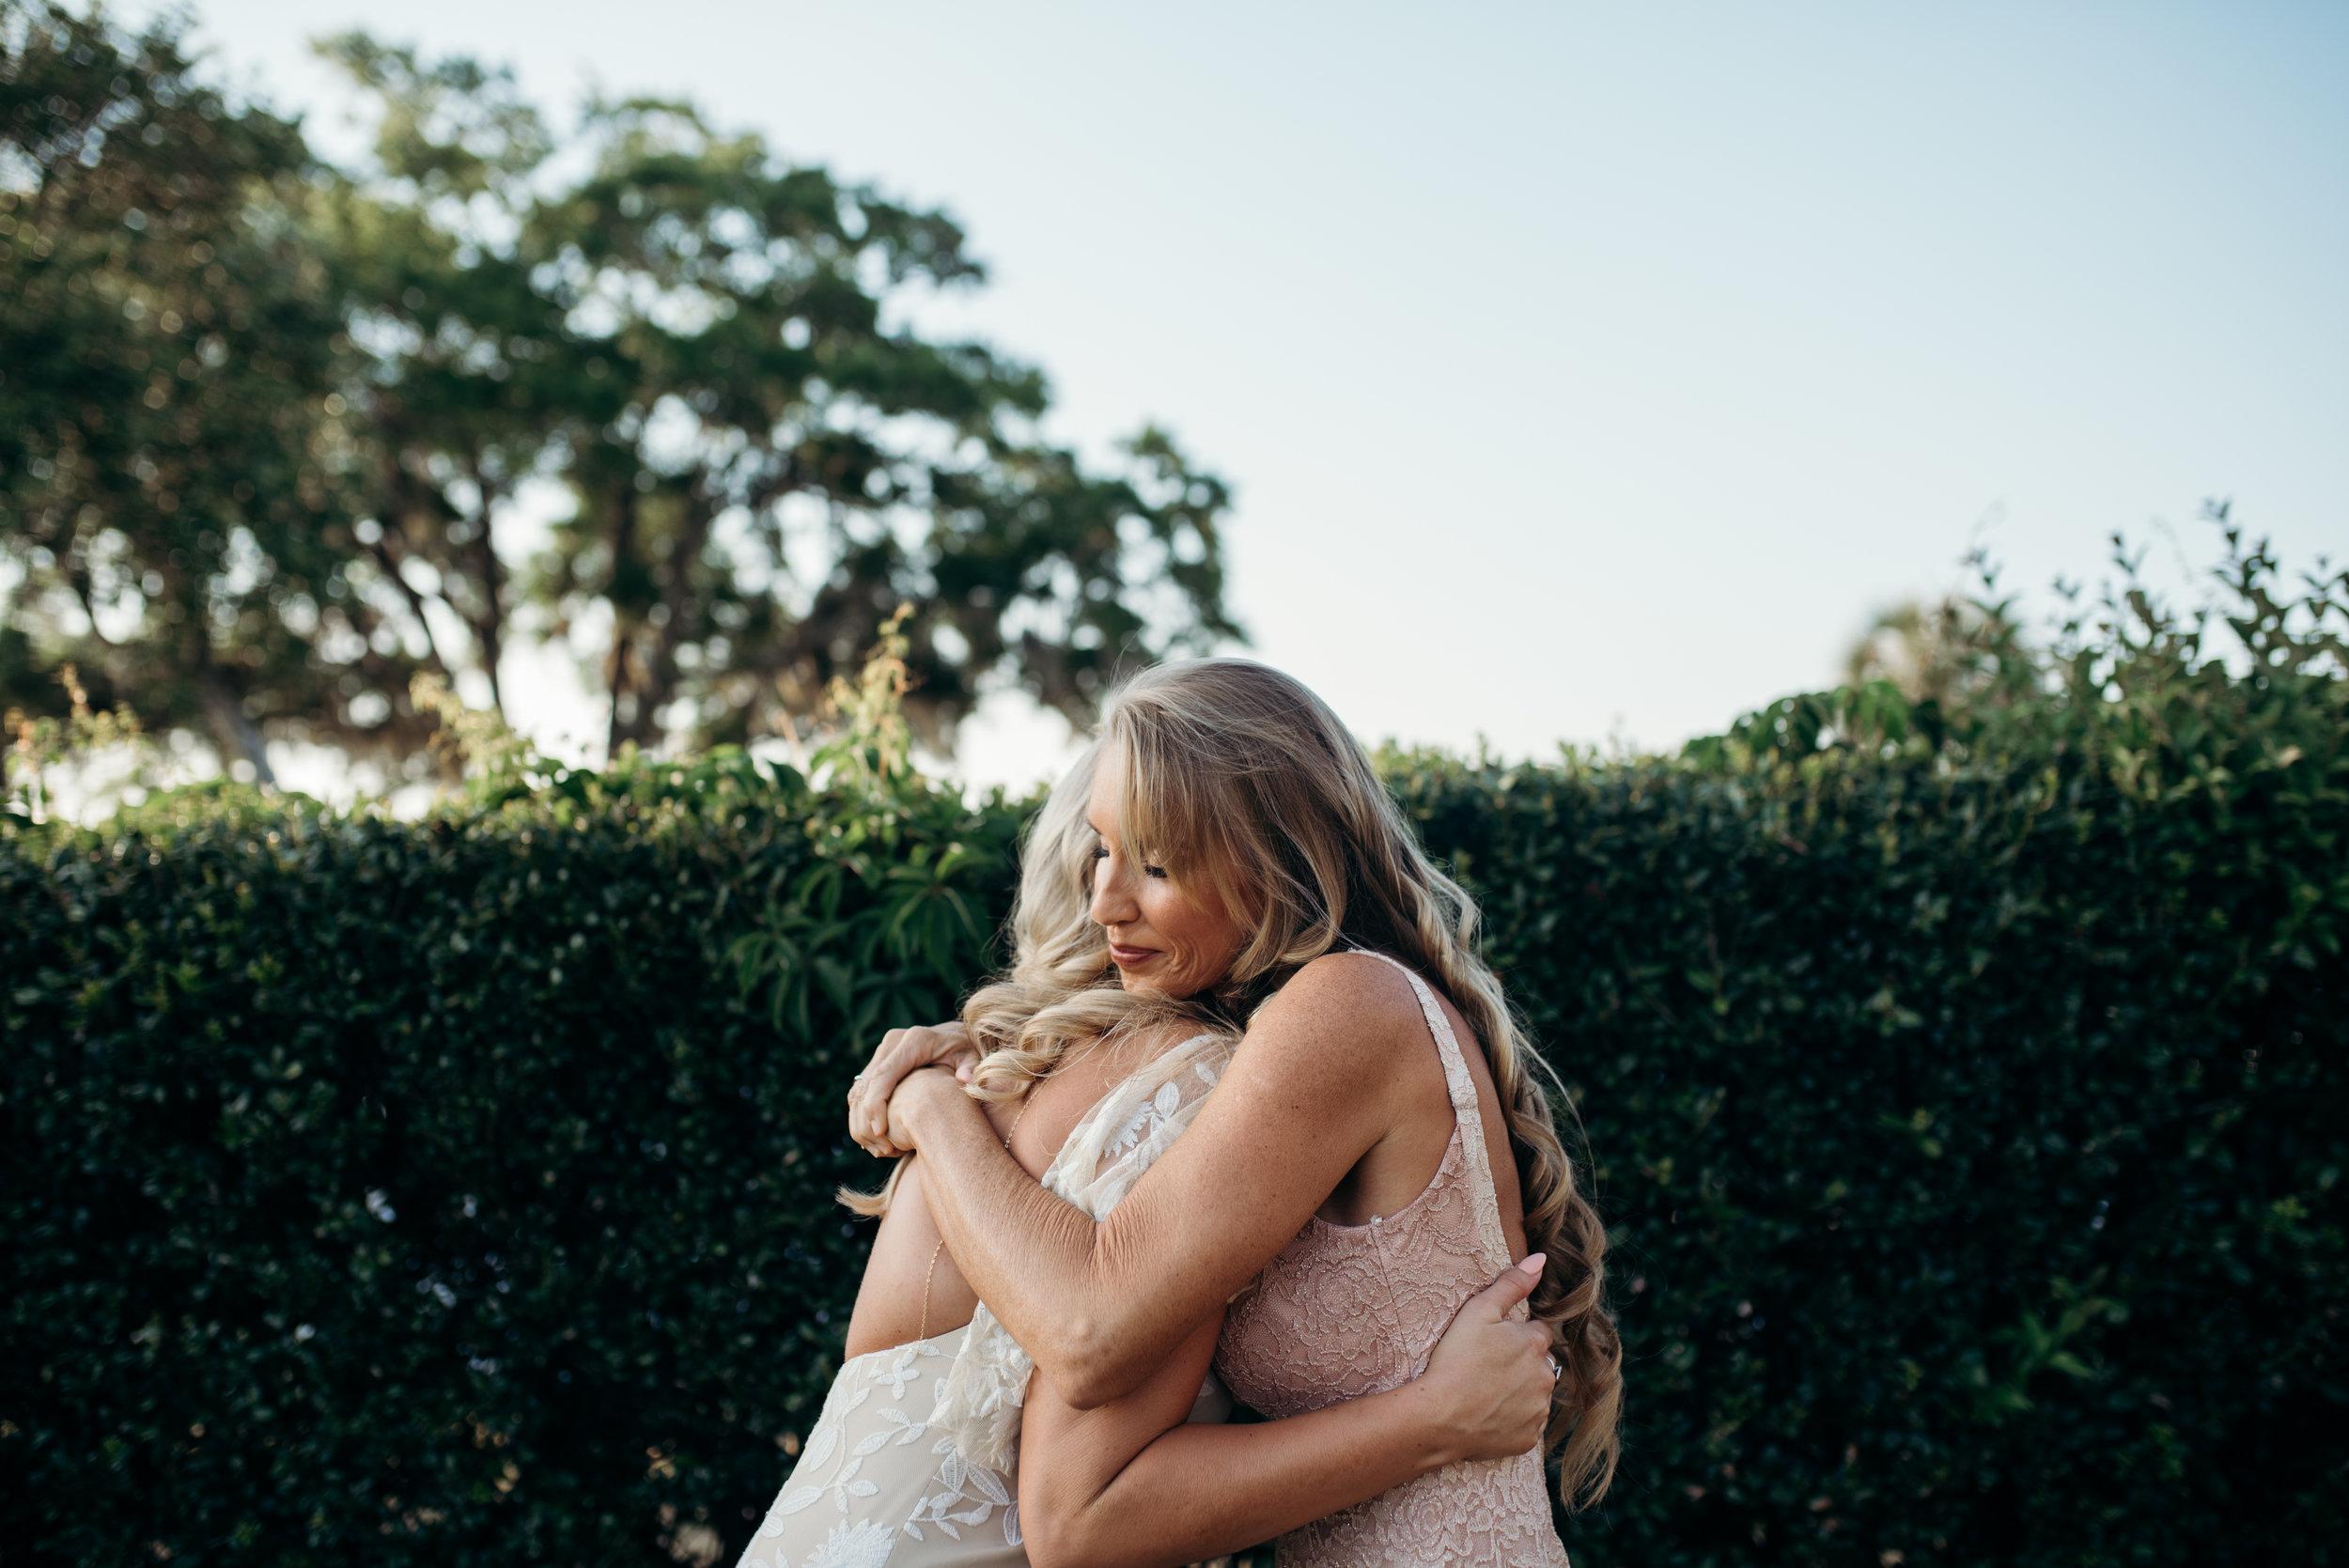 zayda-collin-panama-city-wedding-photography-trippy-bohemian-lisa-frank-wedding-ceremony-190.jpg